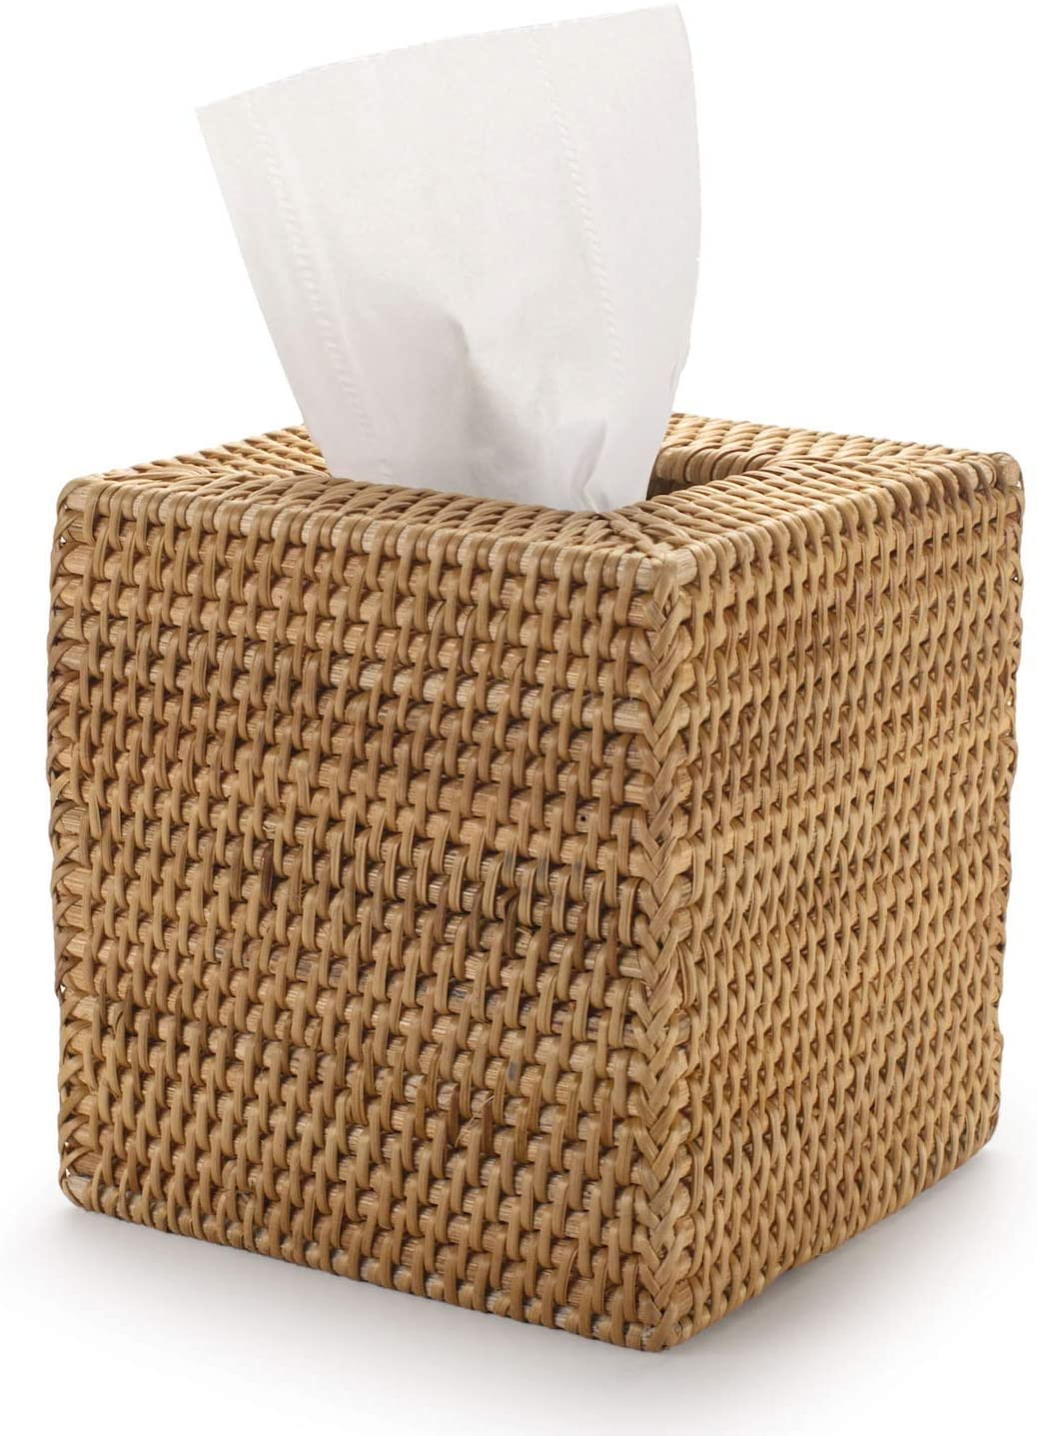 YANGQIHOME Square Rattan Tissue Box Wicker Super beauty product restock quality top! Hand Tis Cover Woven Max 59% OFF